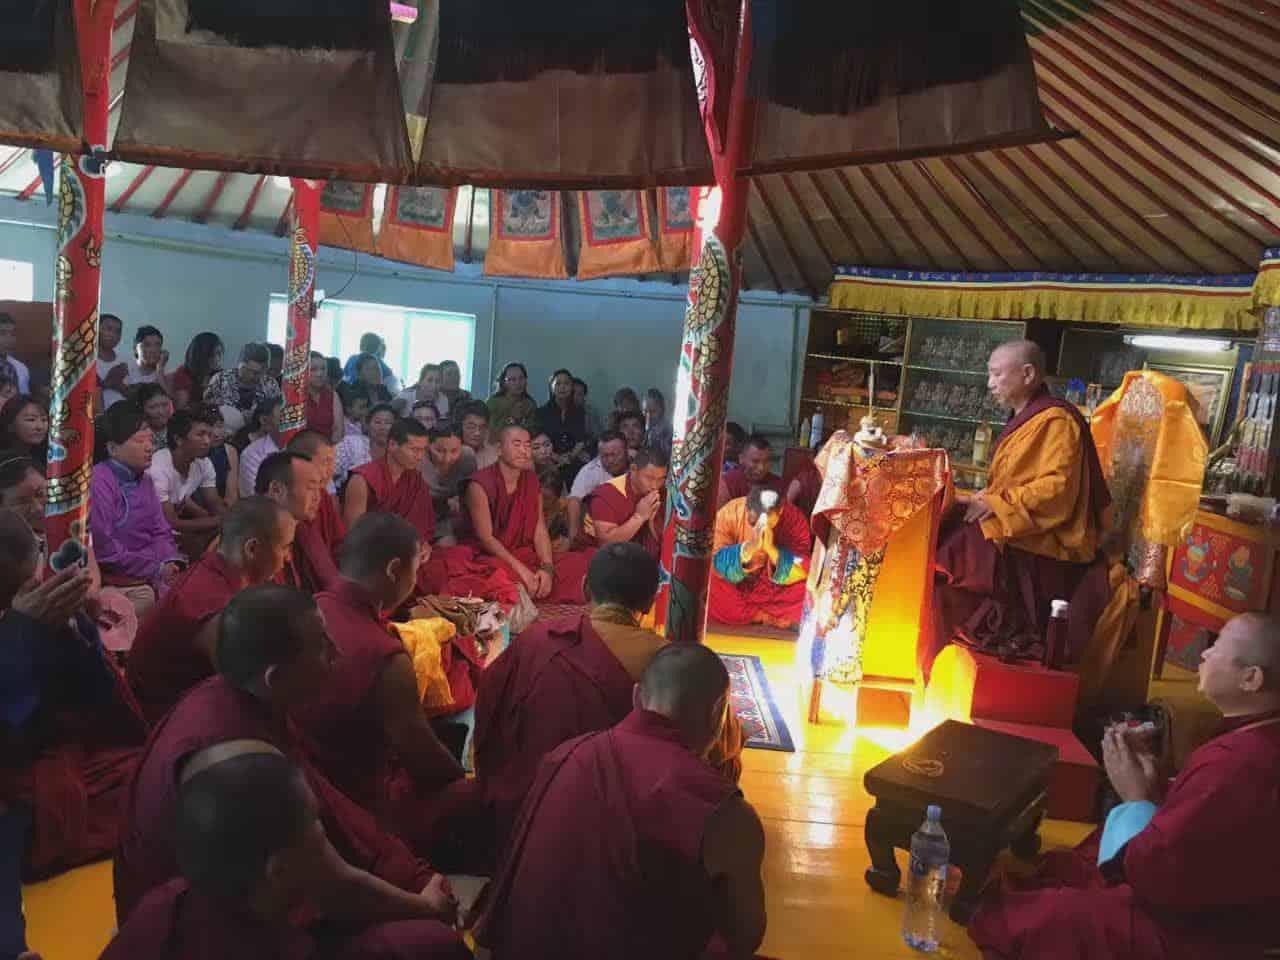 gosok-rinpoche-mongolia-2016-2d29a5fb3f604bf25477a49d65f4b26